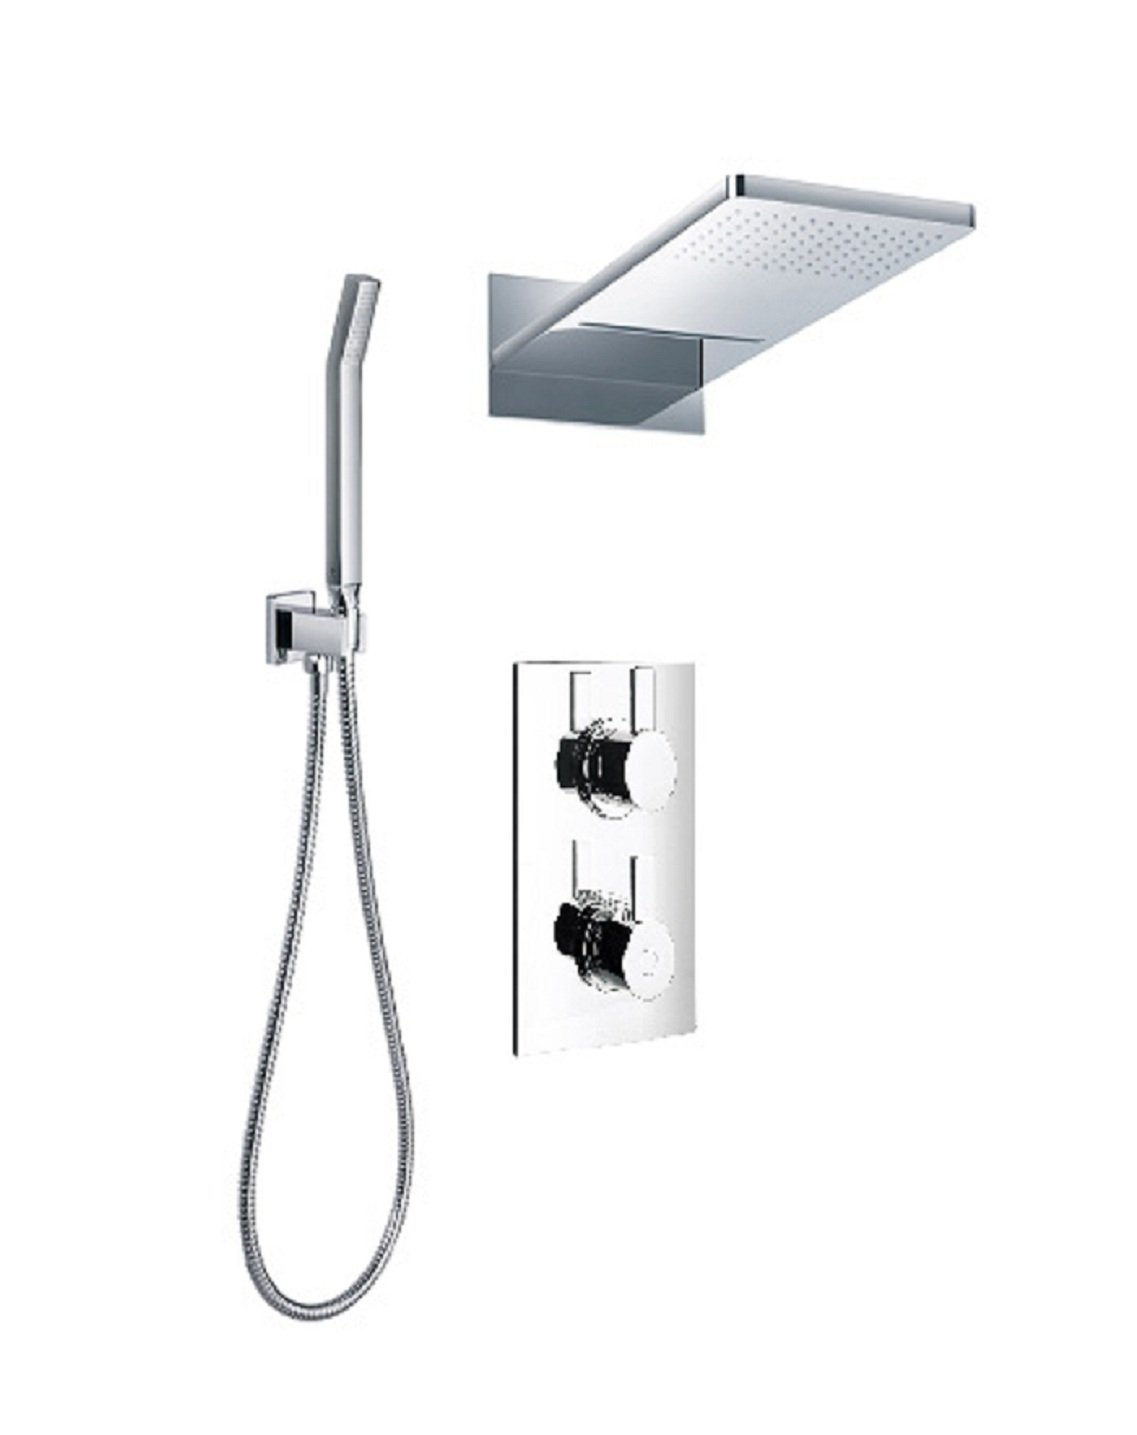 Uberhaus Kitchen Faucet Uberhaus Shower Faucet Rain Shower Hand Shower Model Fh 8379